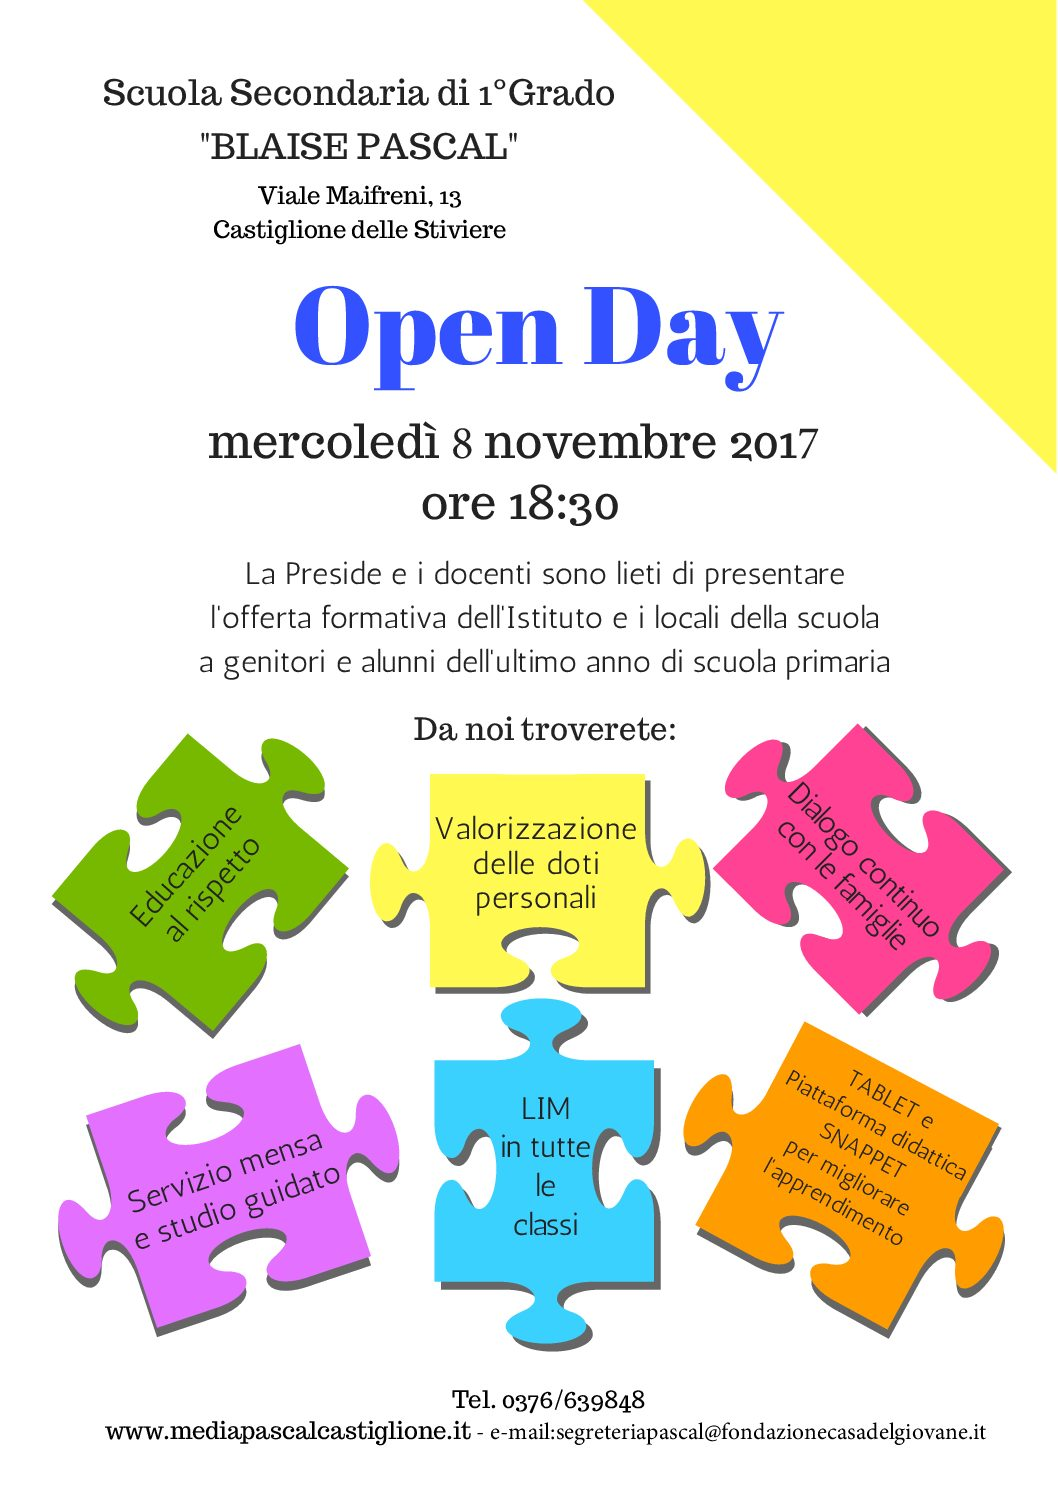 Open Day Scuola Secondaria di primo Grado Blaise Pascal 2017